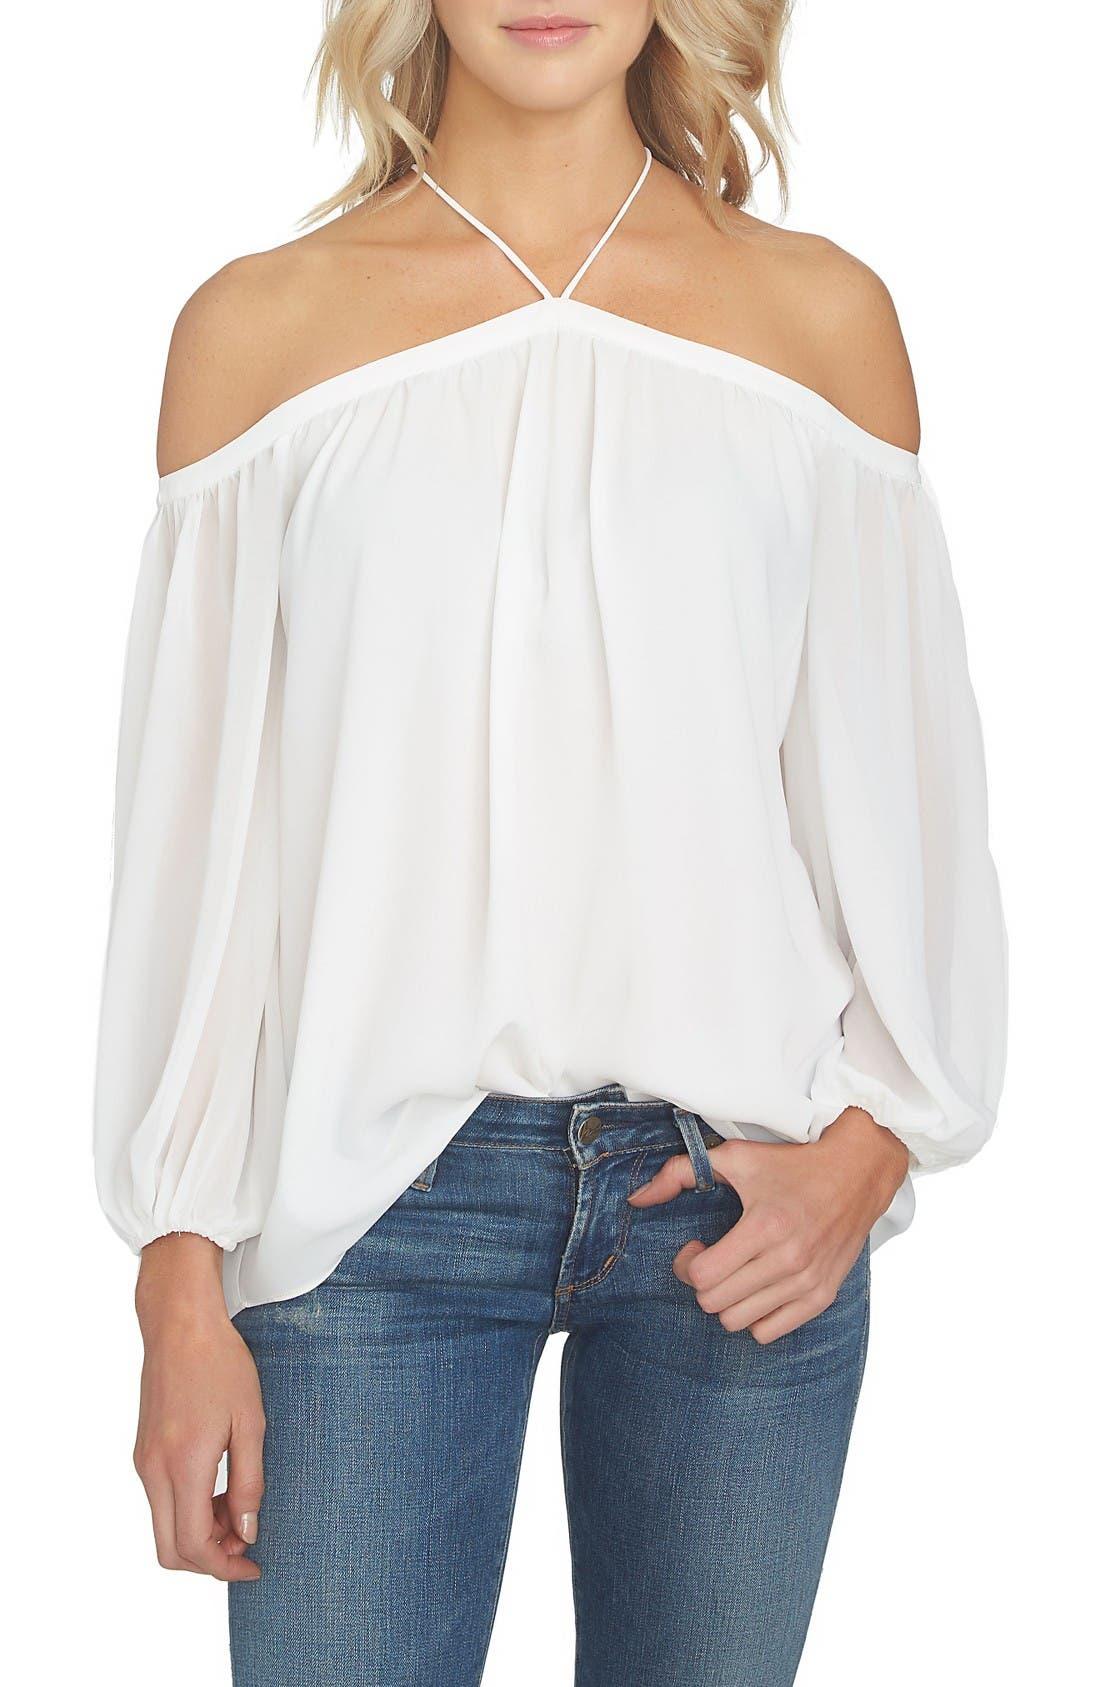 Black ruffled short sleeve off the shoulder tshirt